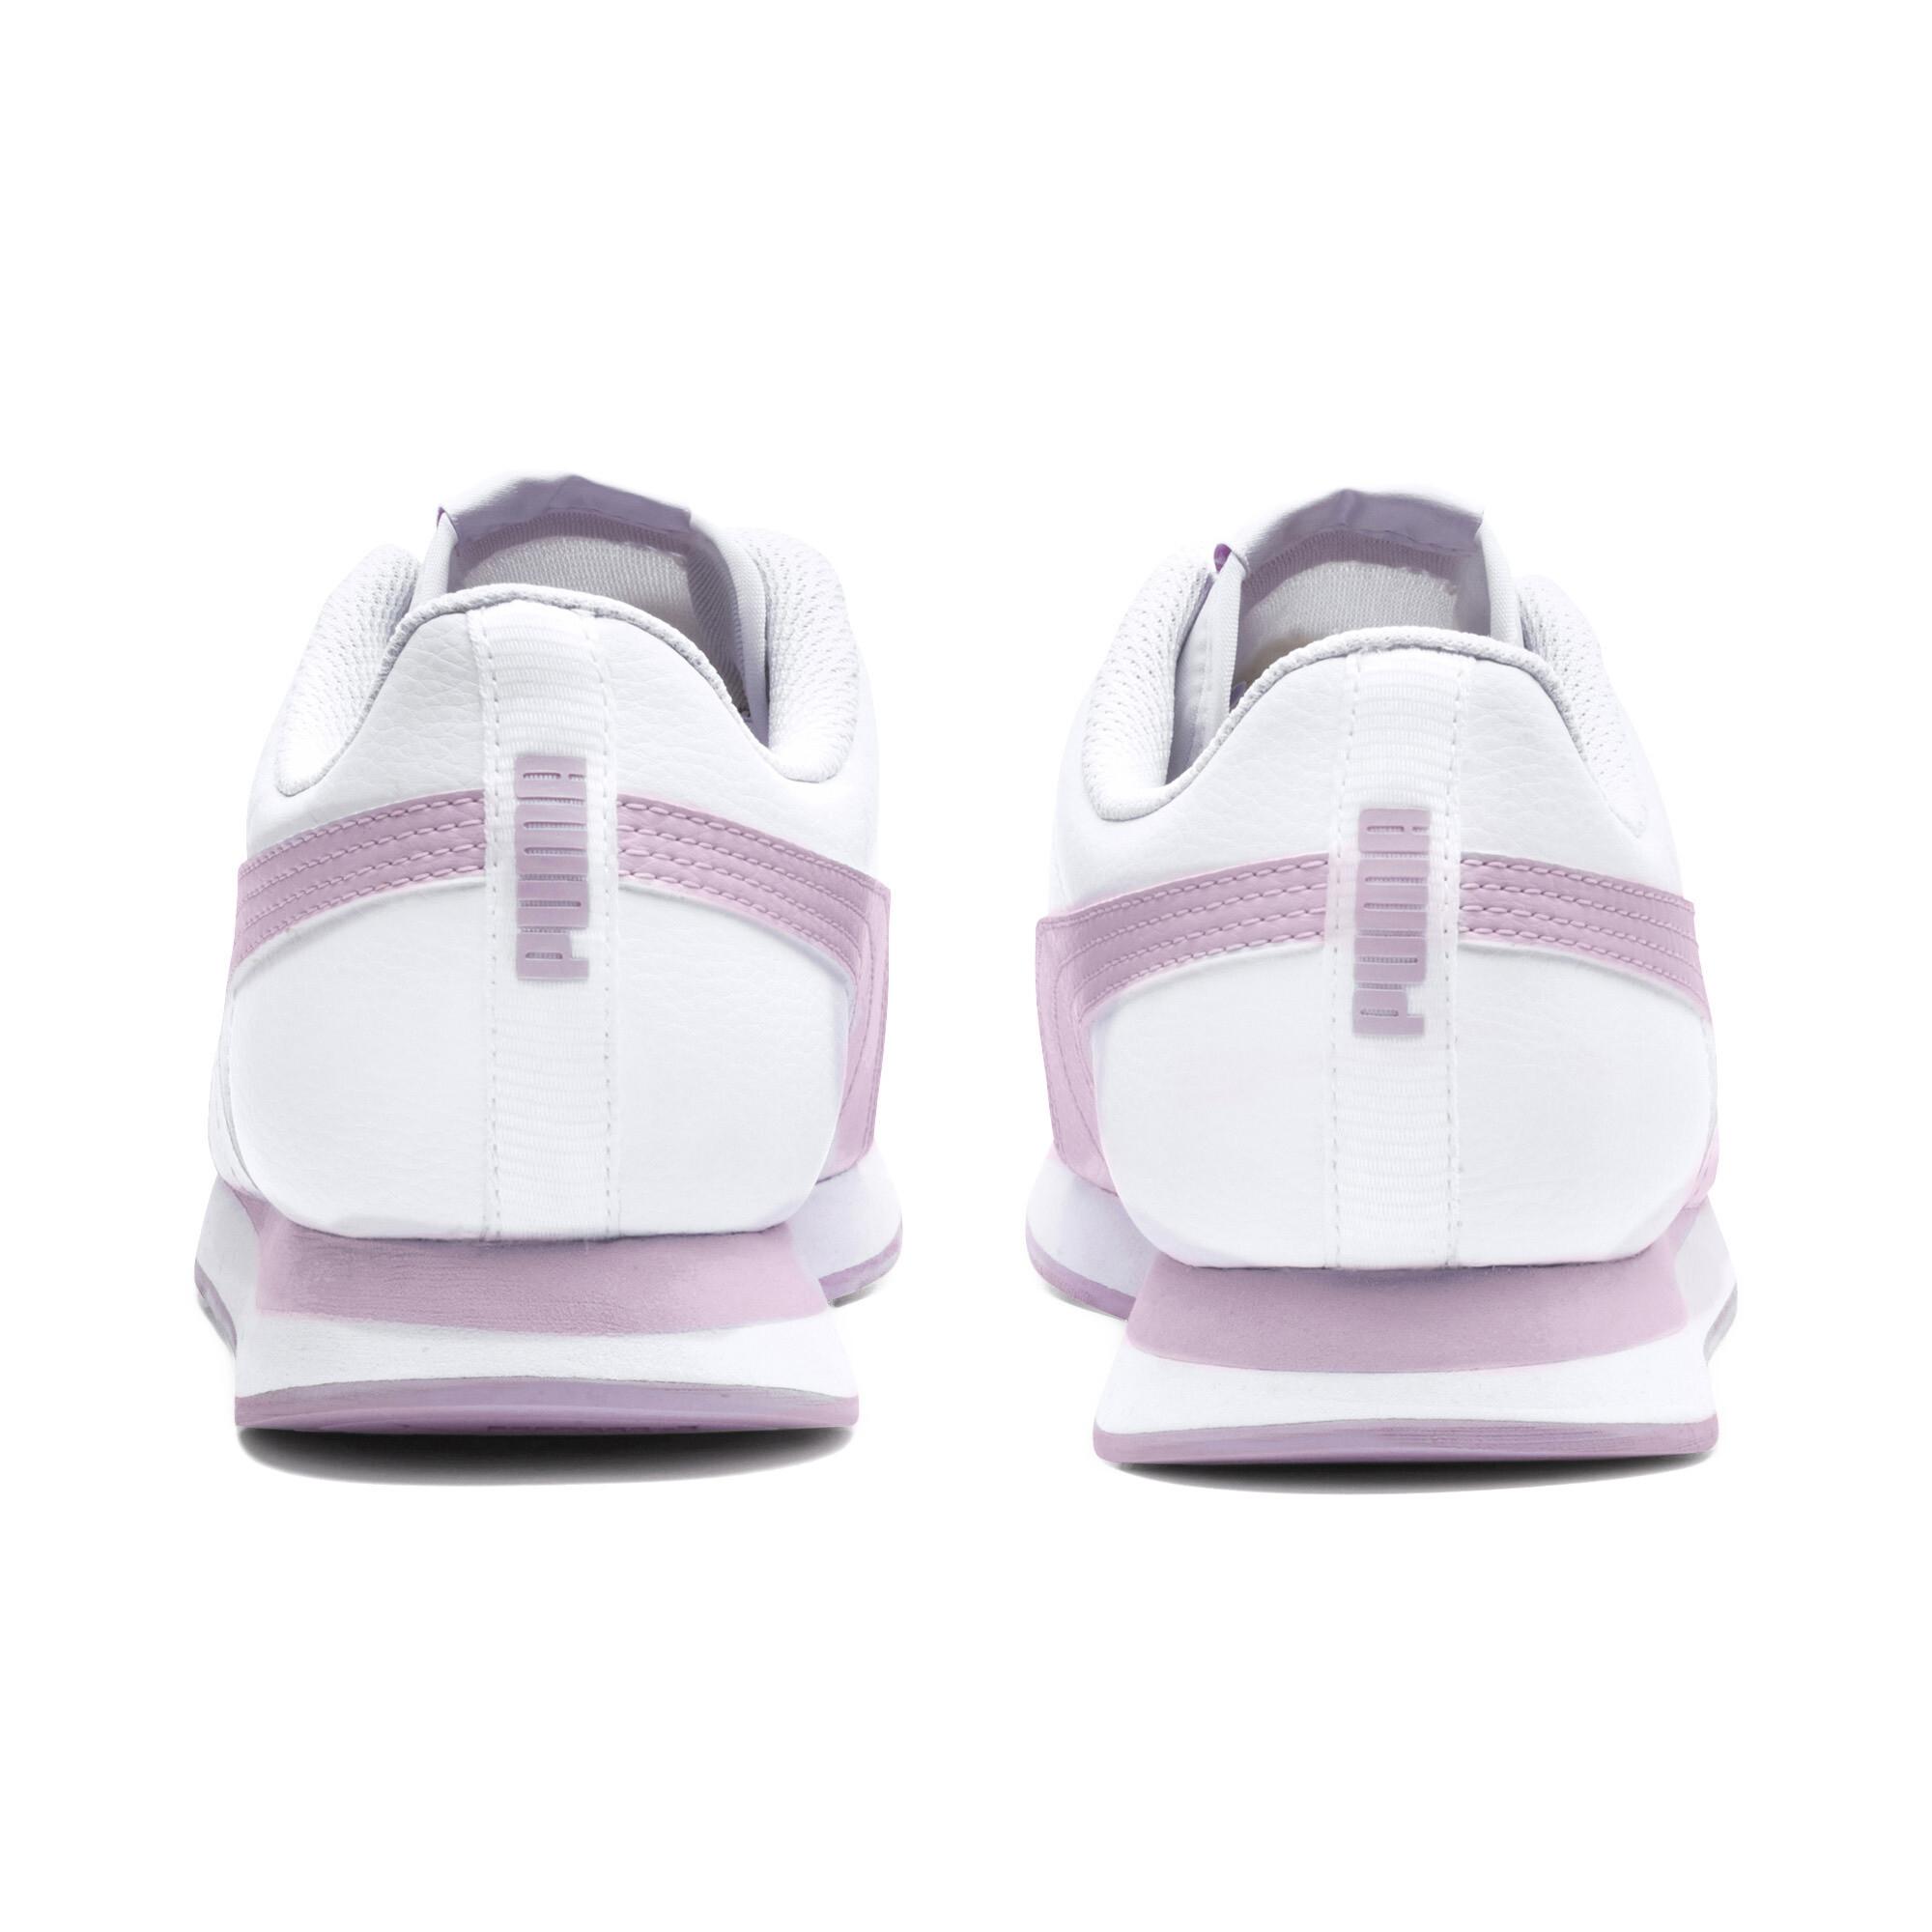 thumbnail 15 - PUMA Men's Turin II Sneakers